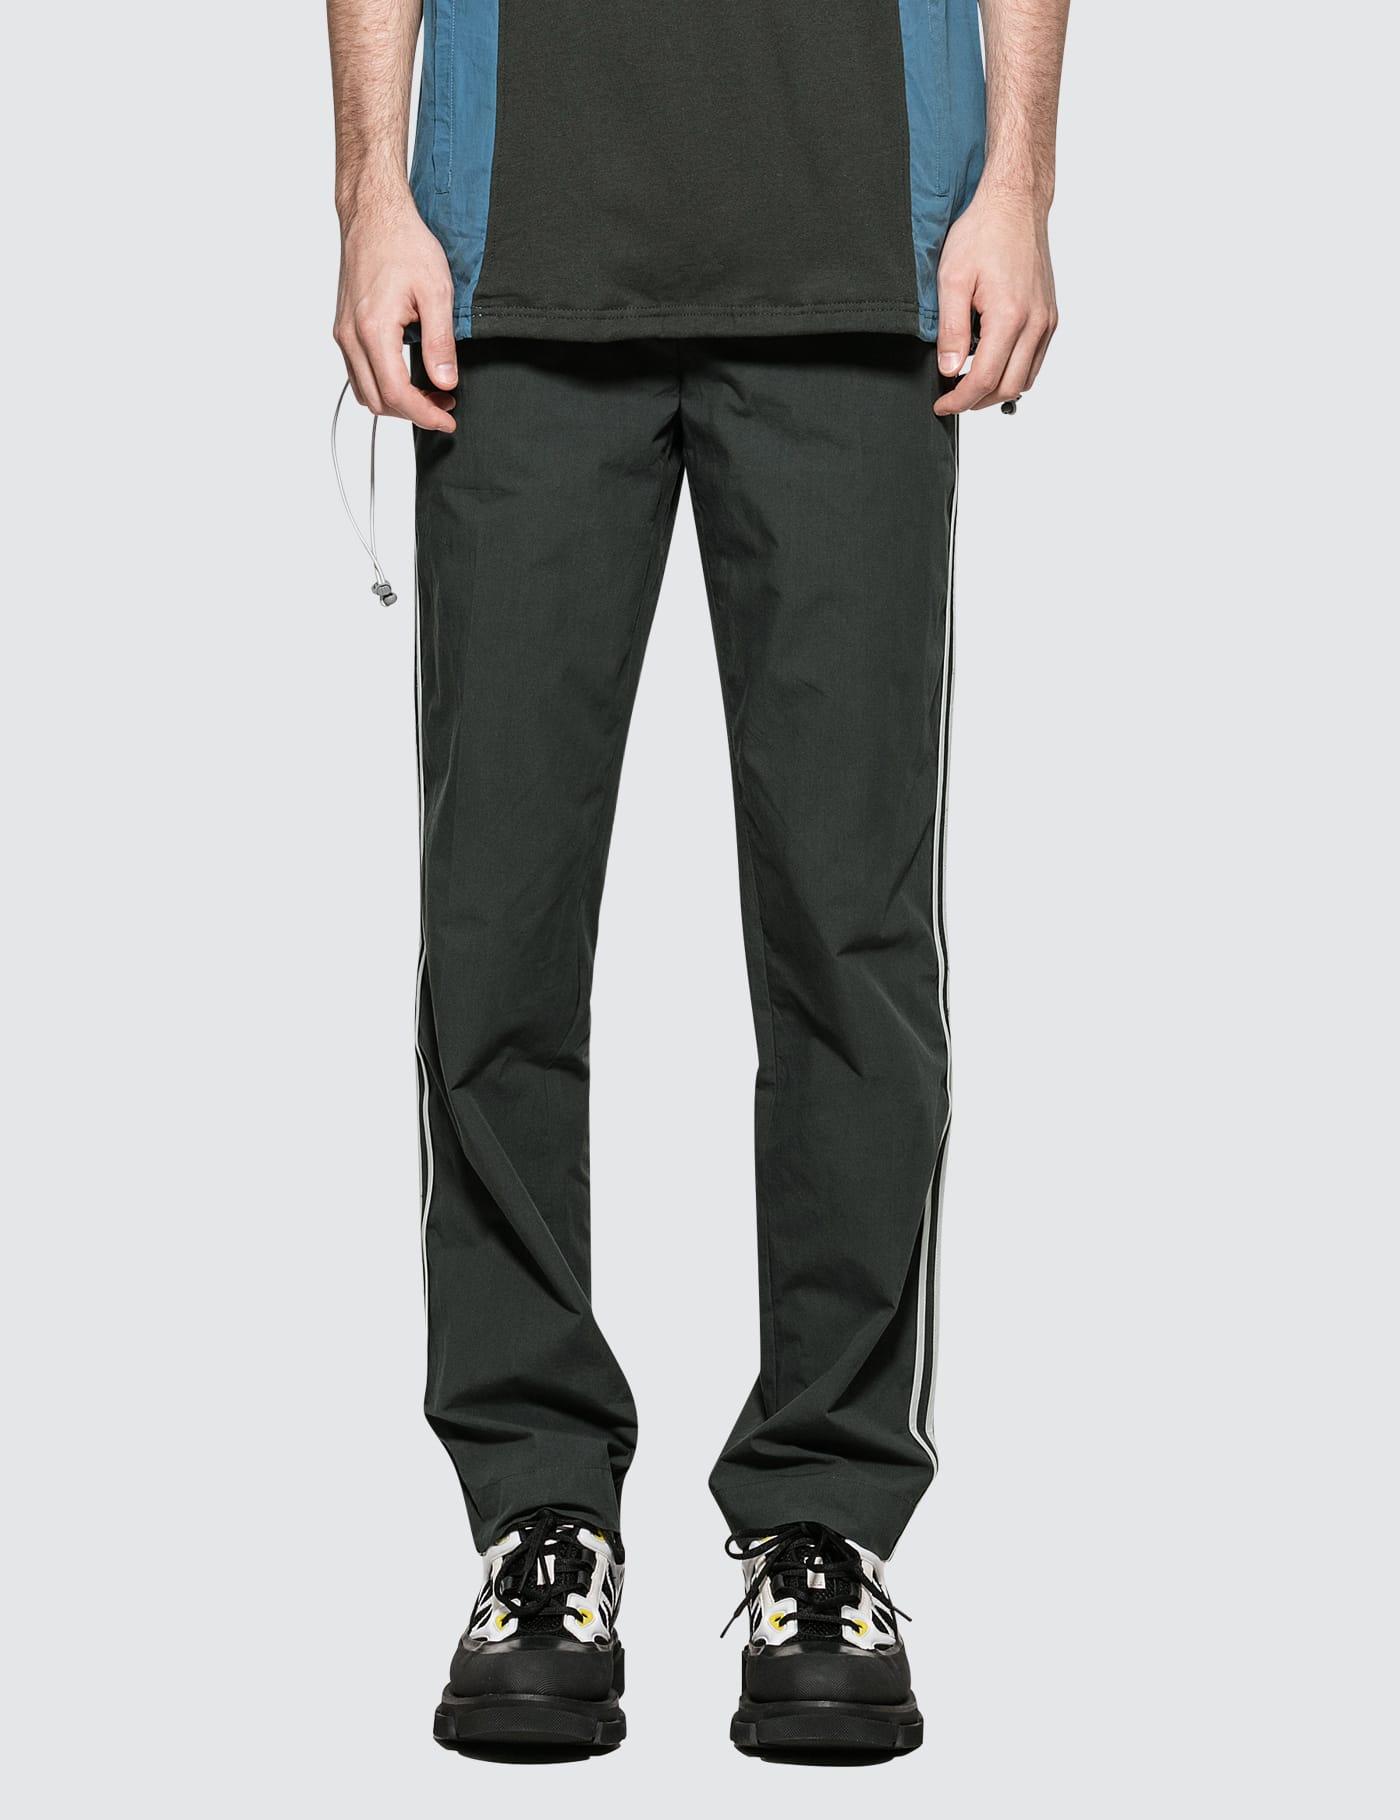 C2H4 Los Angeles Inside Out Tailor Pants Picture